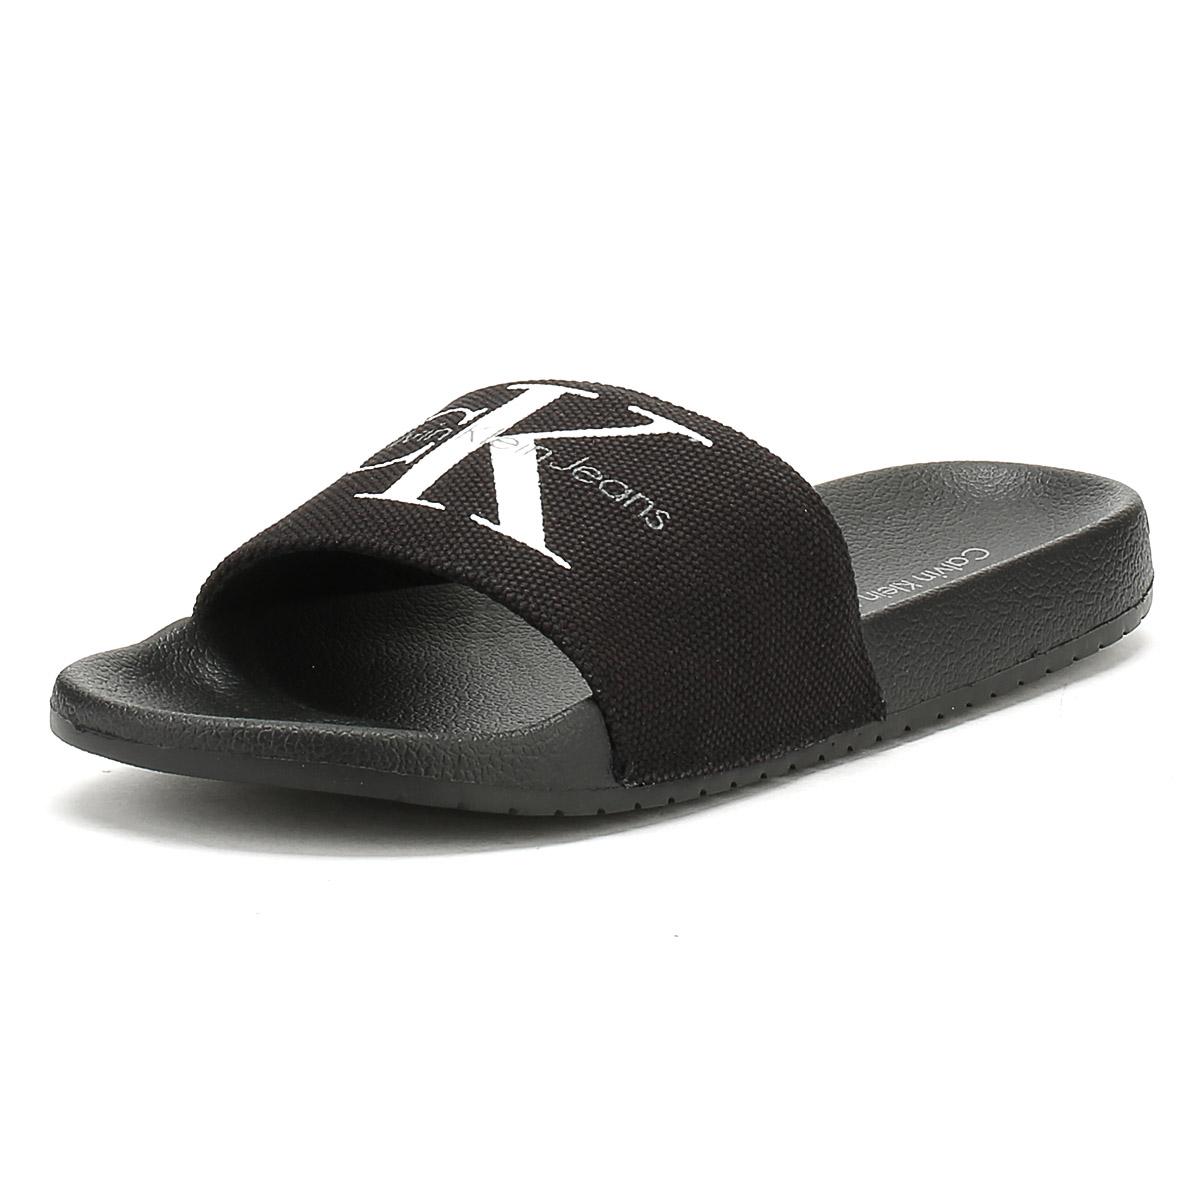 f0a6188176a Details about Calvin Klein Jeans Mens Black Viggo Slides Summer Flip Flops  Beach Shoes